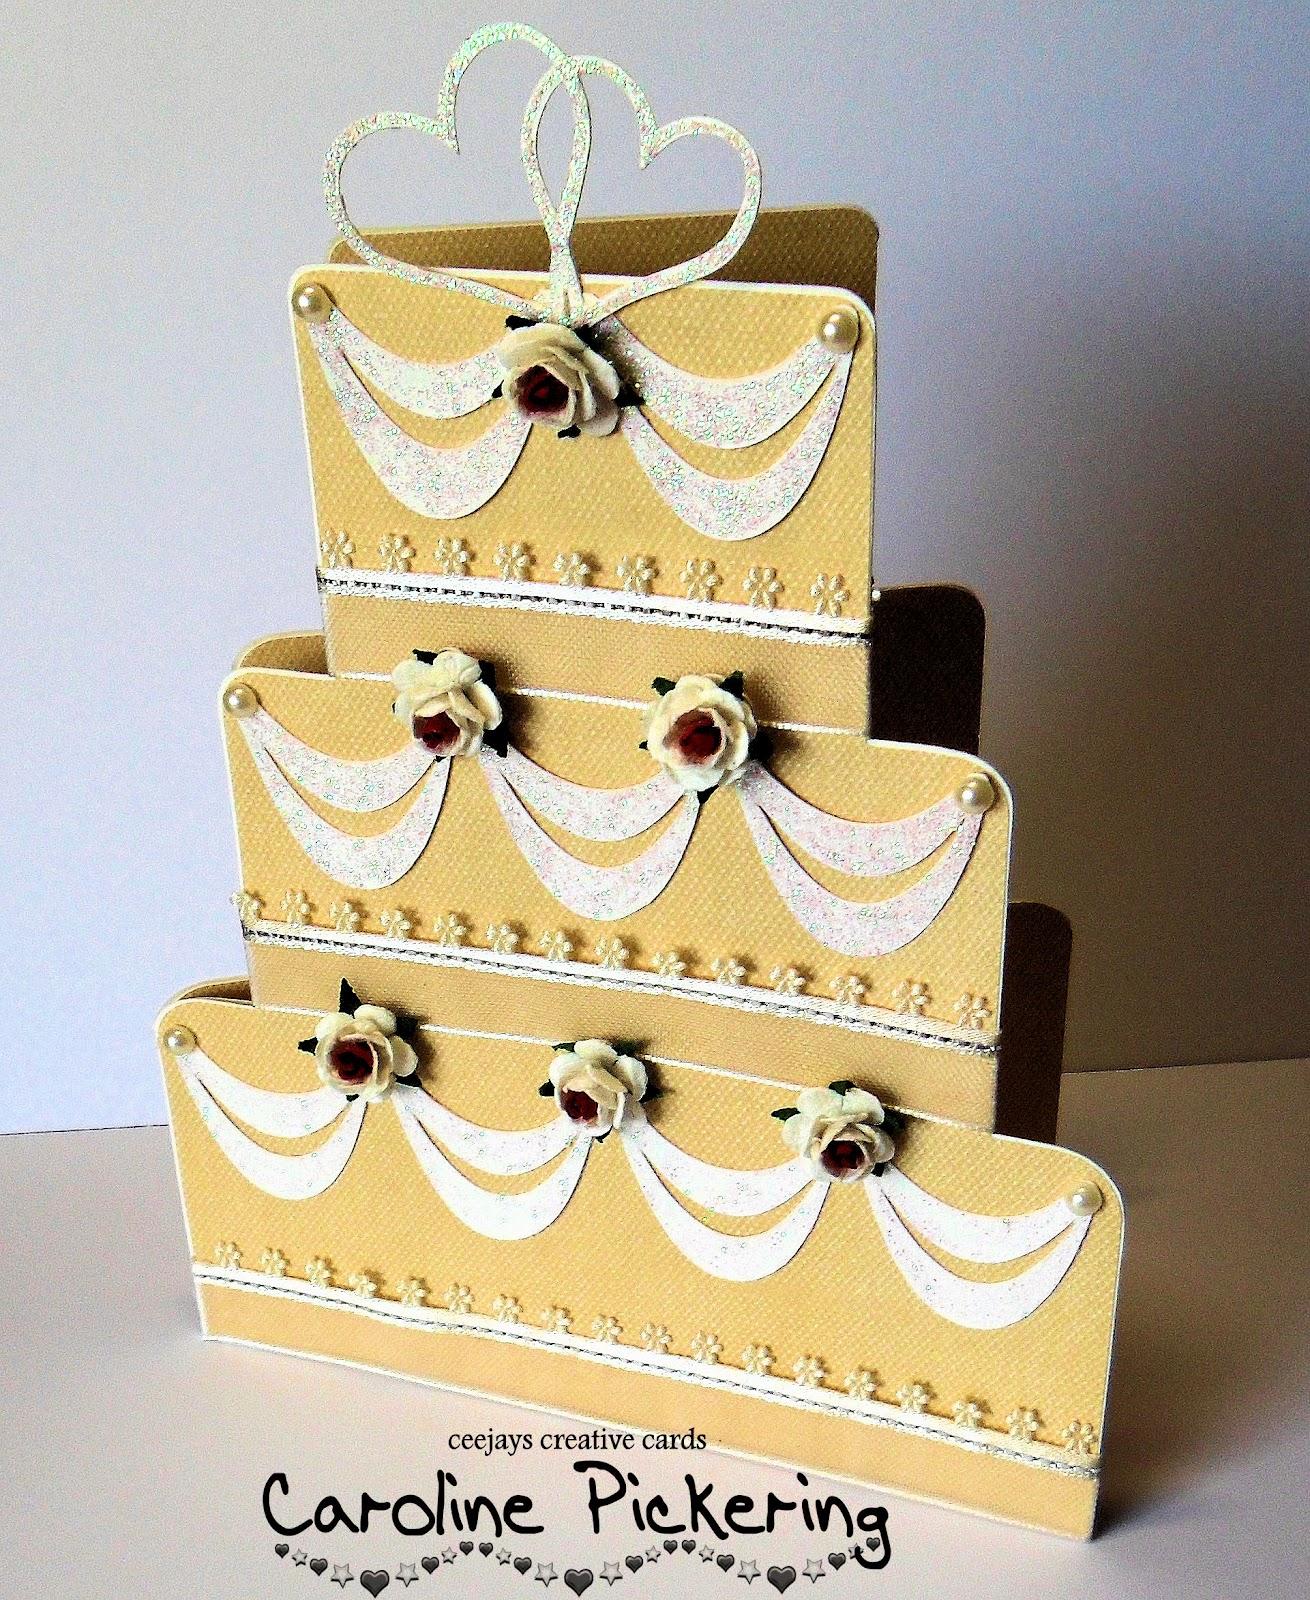 How To Make A Wedding Cake Card Box